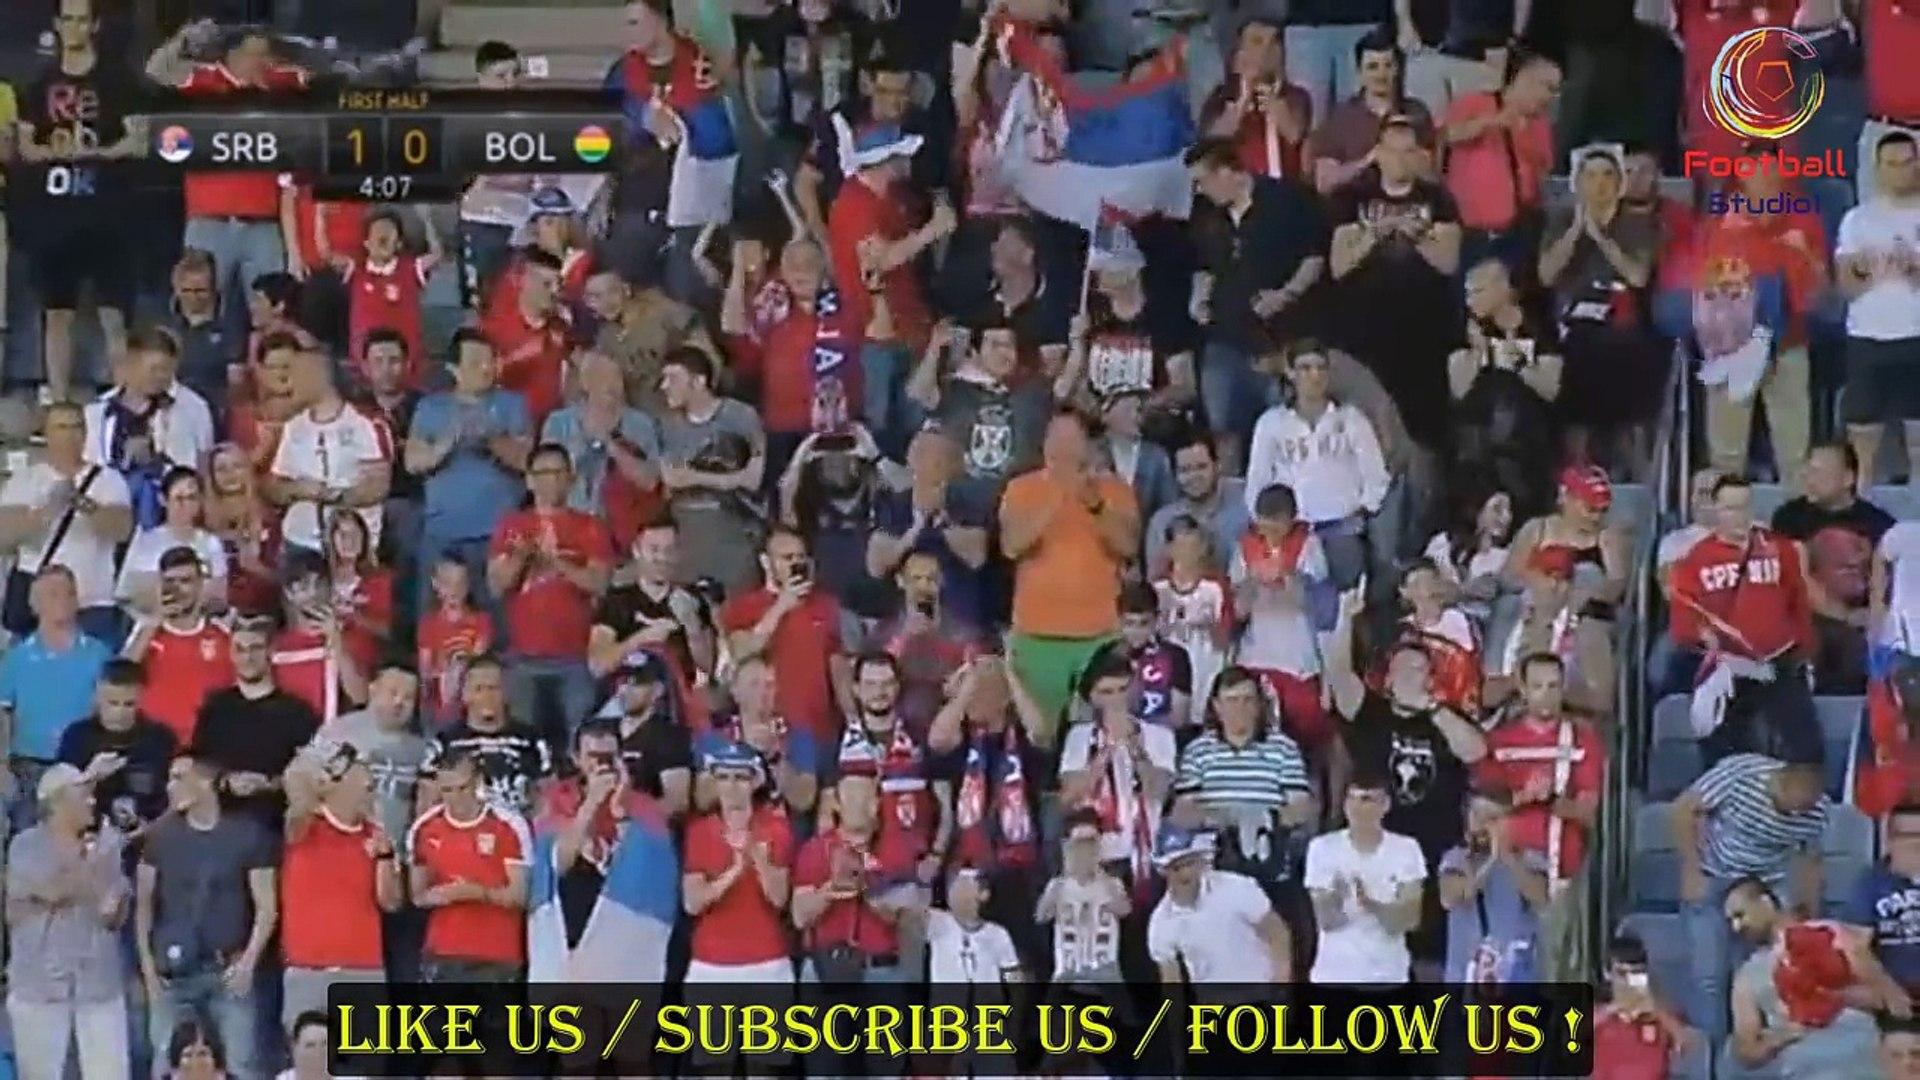 Srbija 5 - 1 Bolivija | All Goals | Golovi | Sažetak HD (09/06/2018 Friendlies)